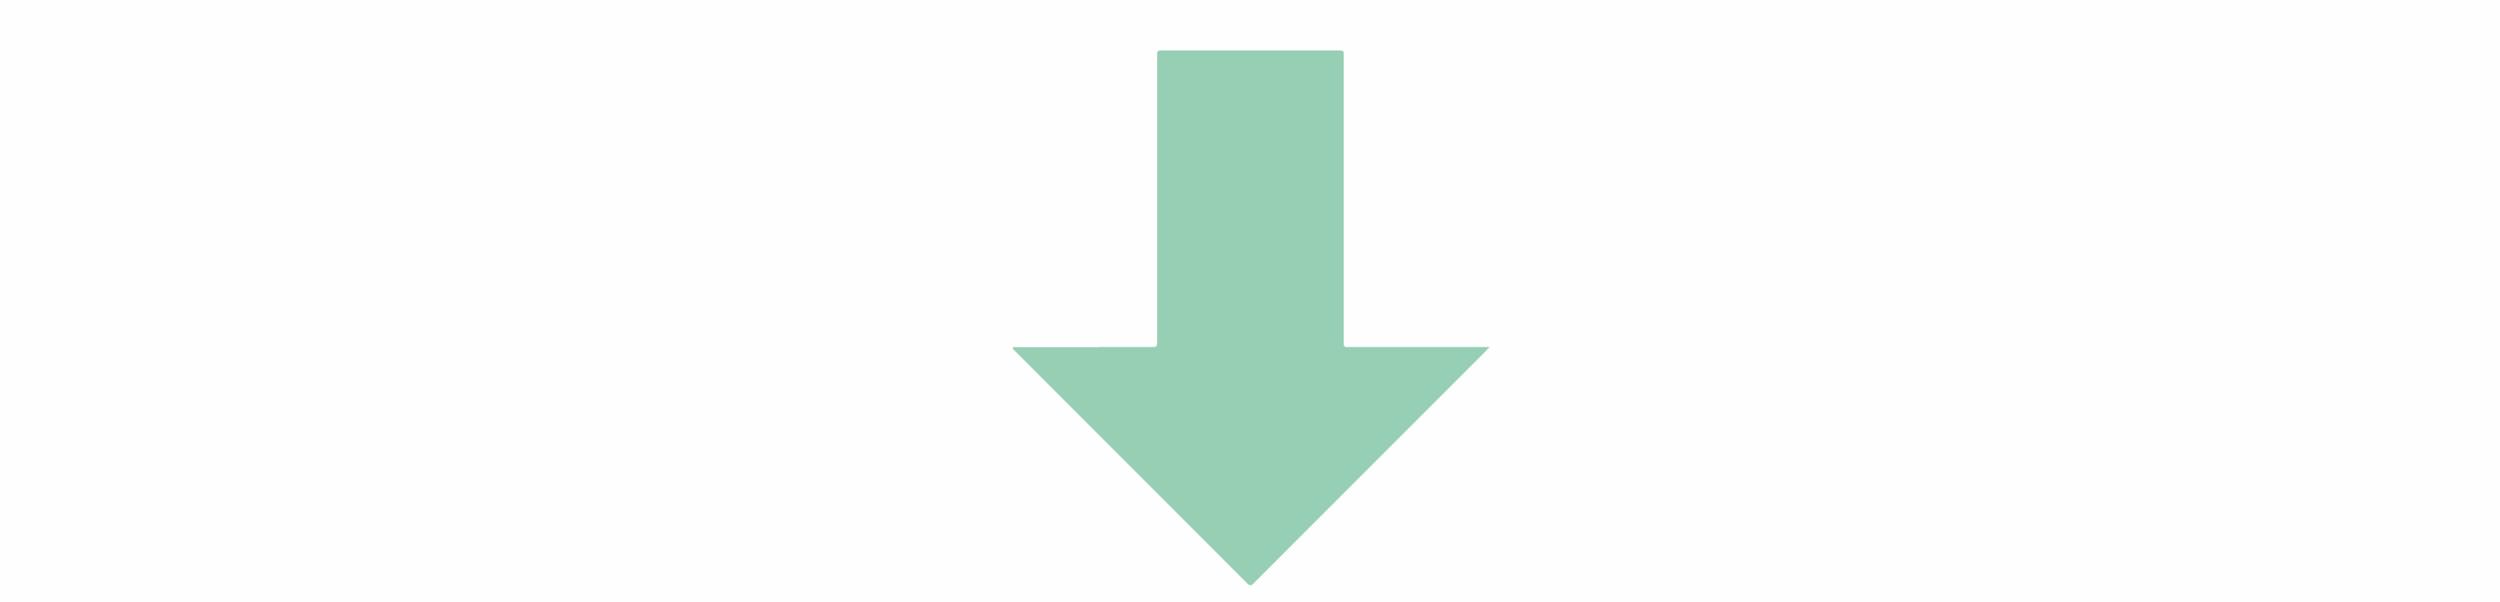 arrowgreen.png